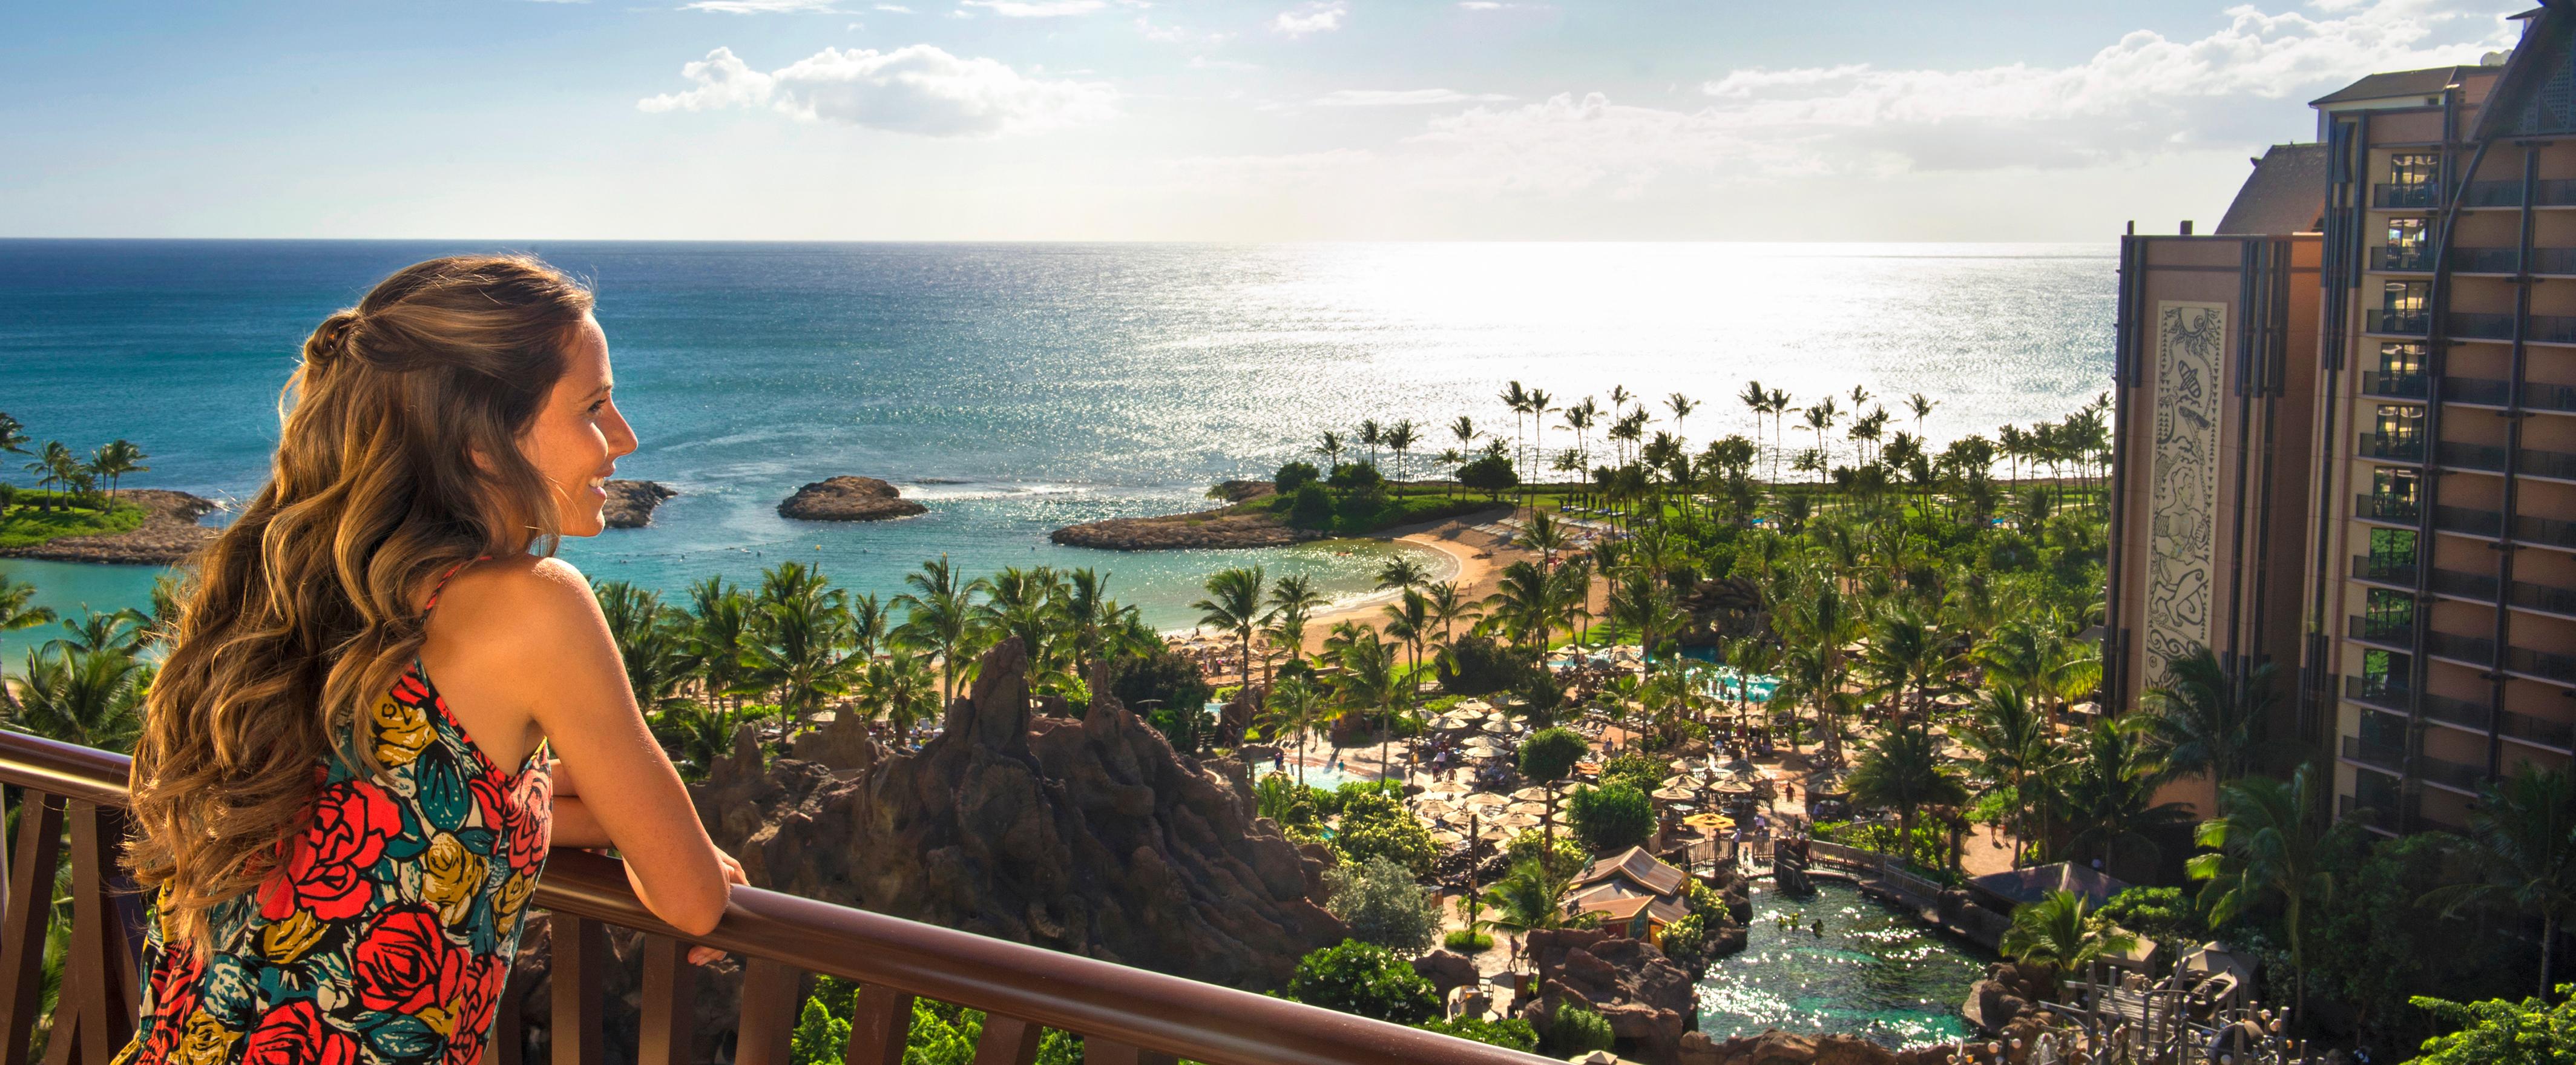 Oahu Hotel Rooms Amp Suites Aulani Hawaii Resort Amp Spa